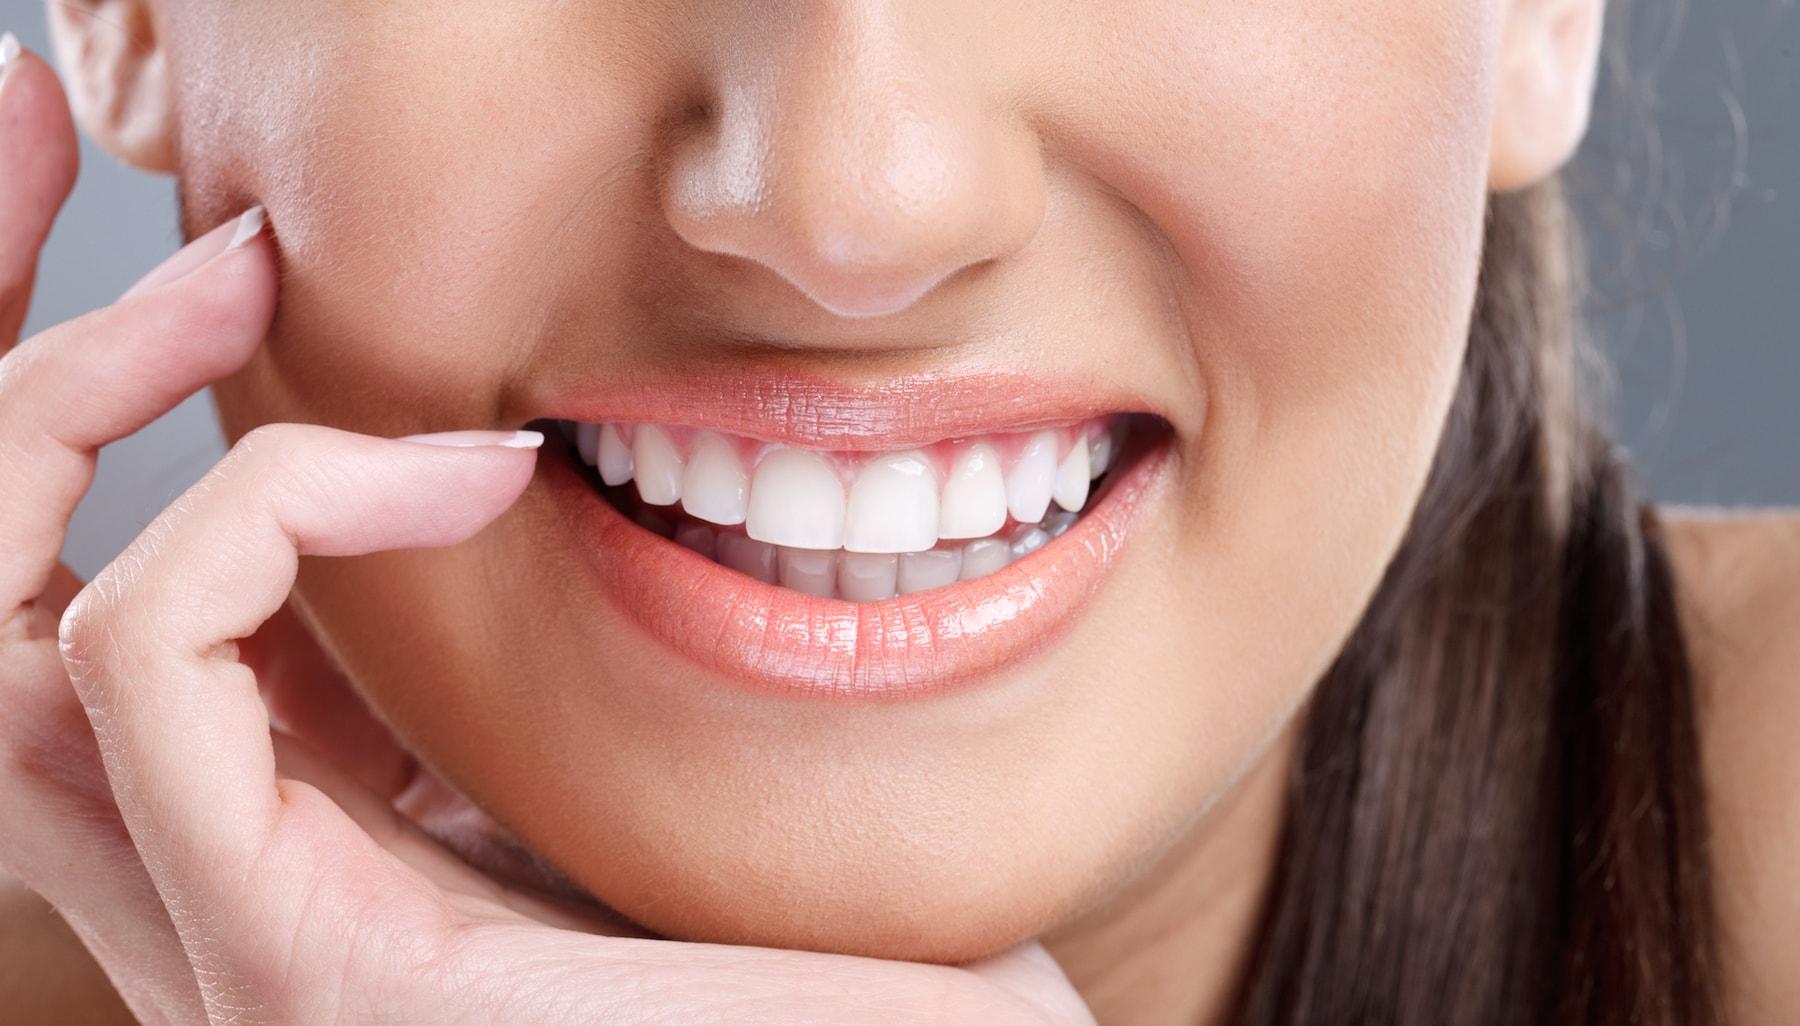 Zoom teeth whitening gives people noticeably brighter teeth